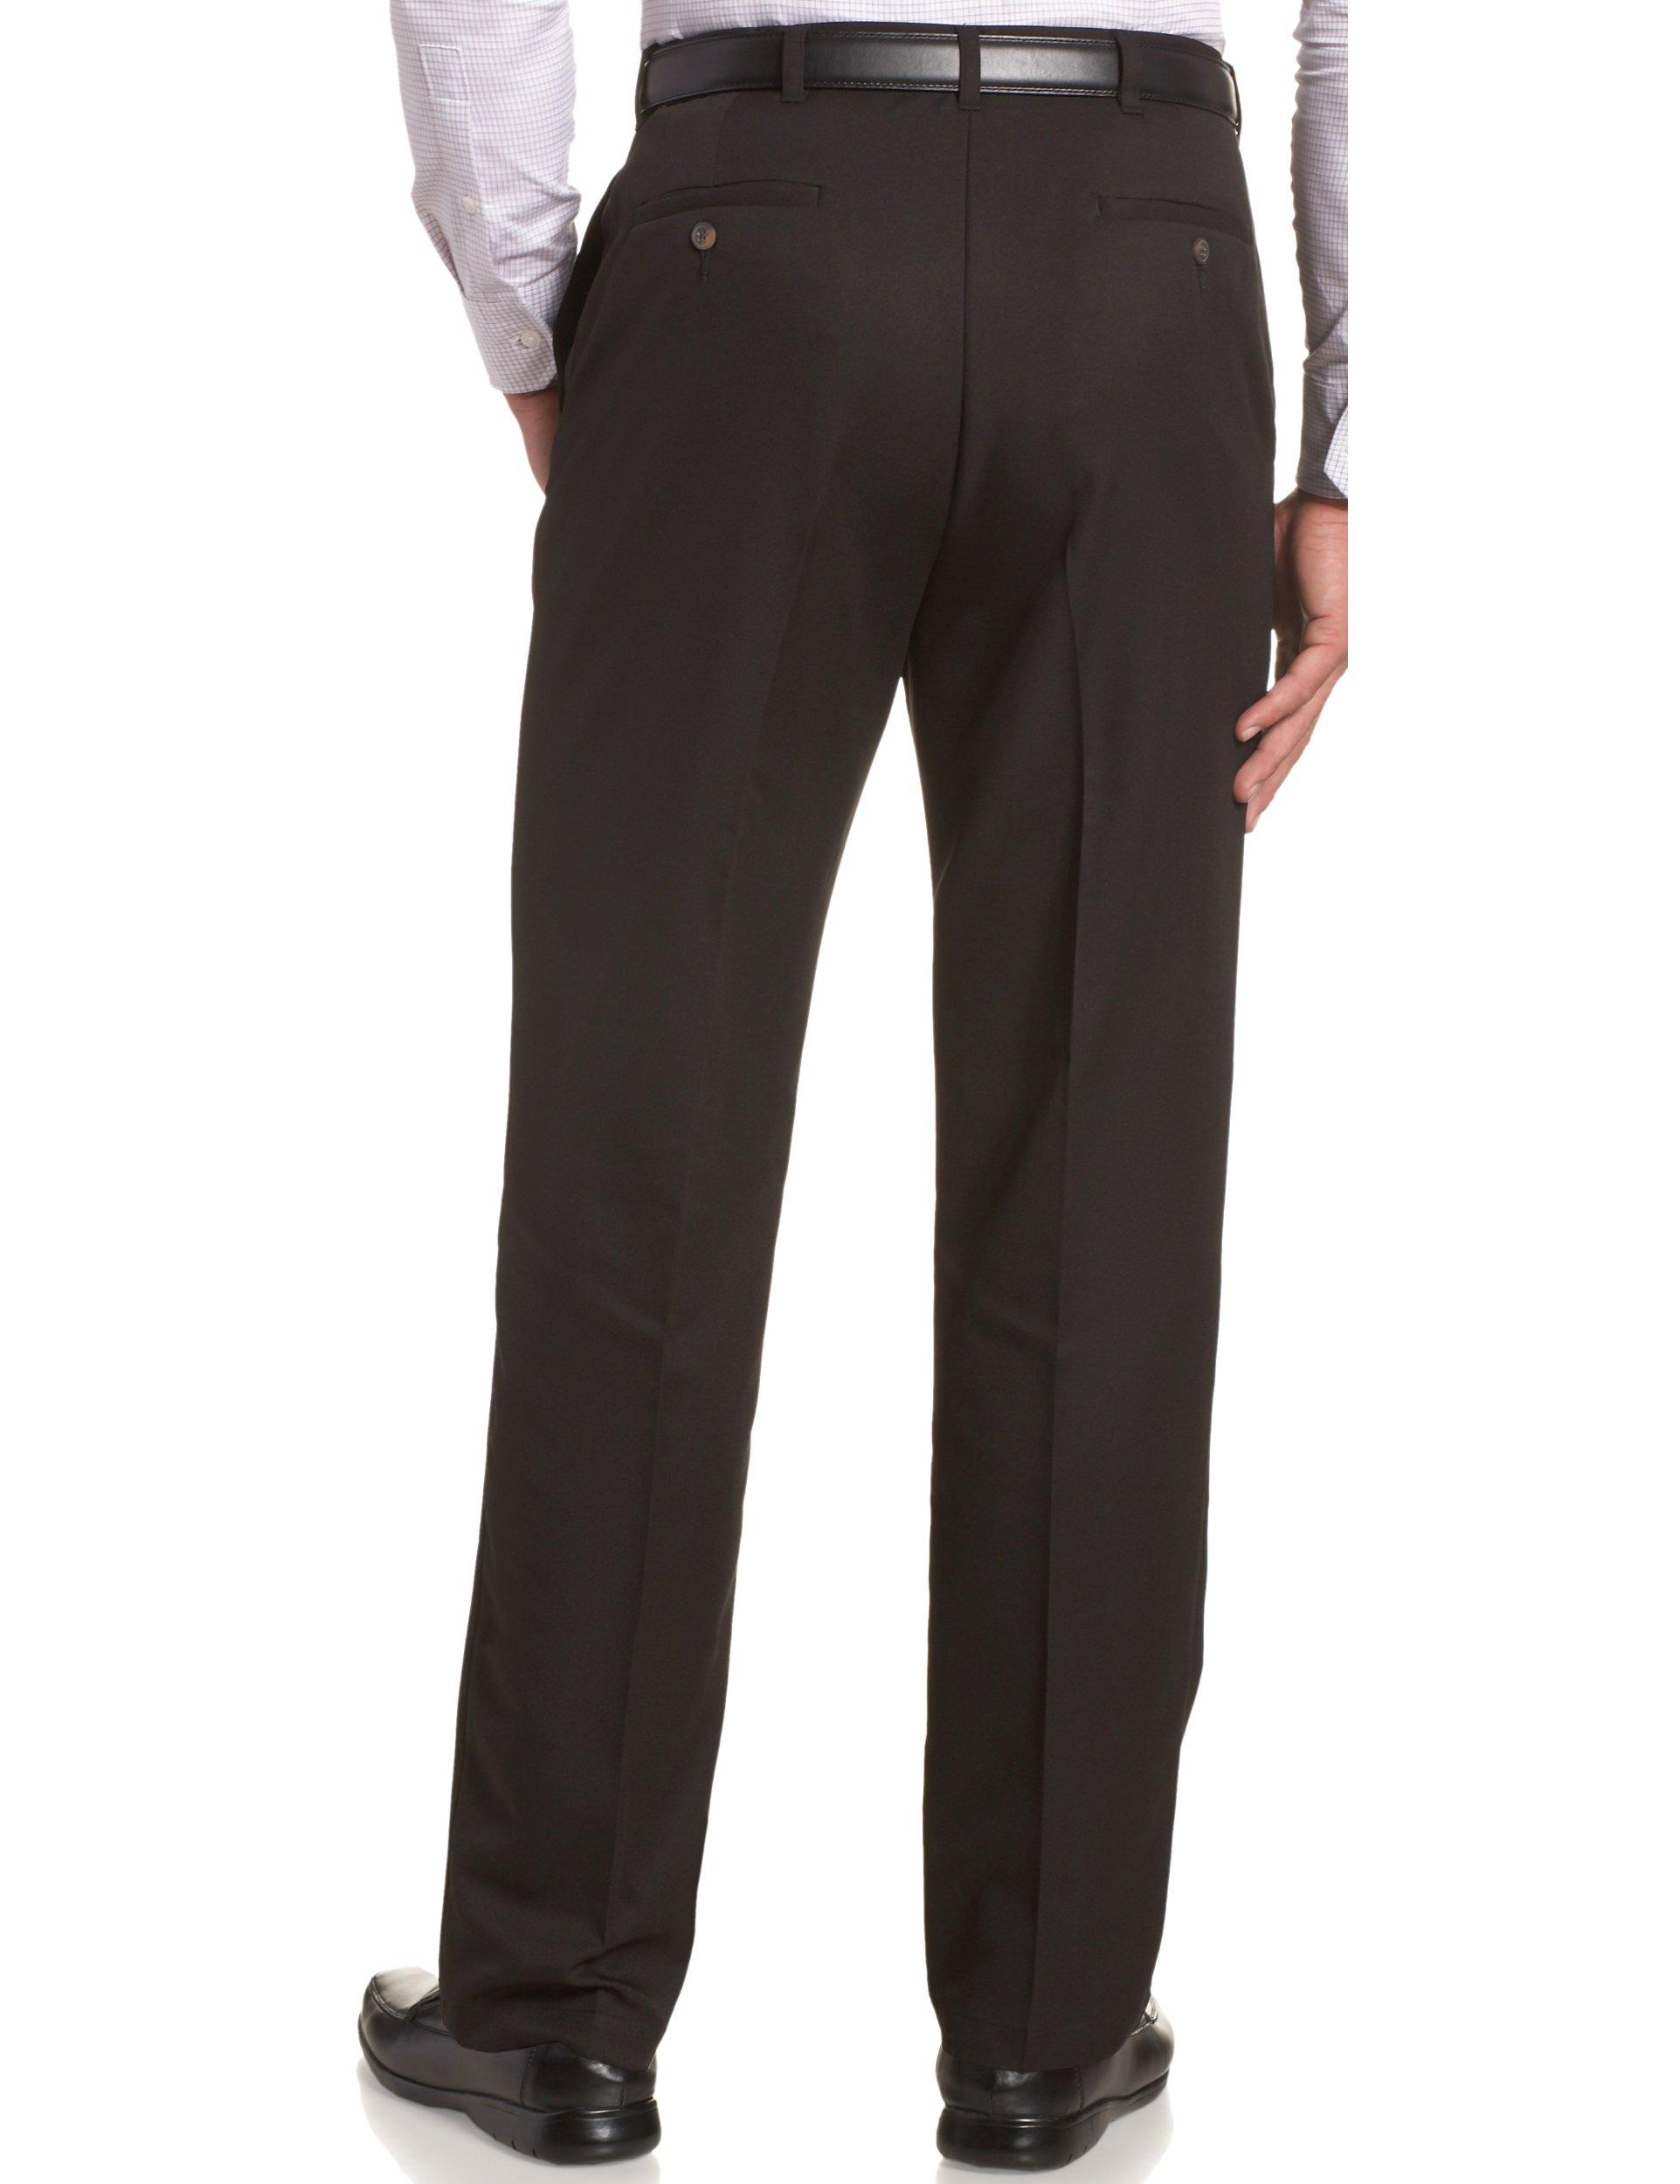 Haggar Men's Cool 18 Hidden Comfort Waist Plain Front Pant,Black,38x29 by Haggar (Image #2)